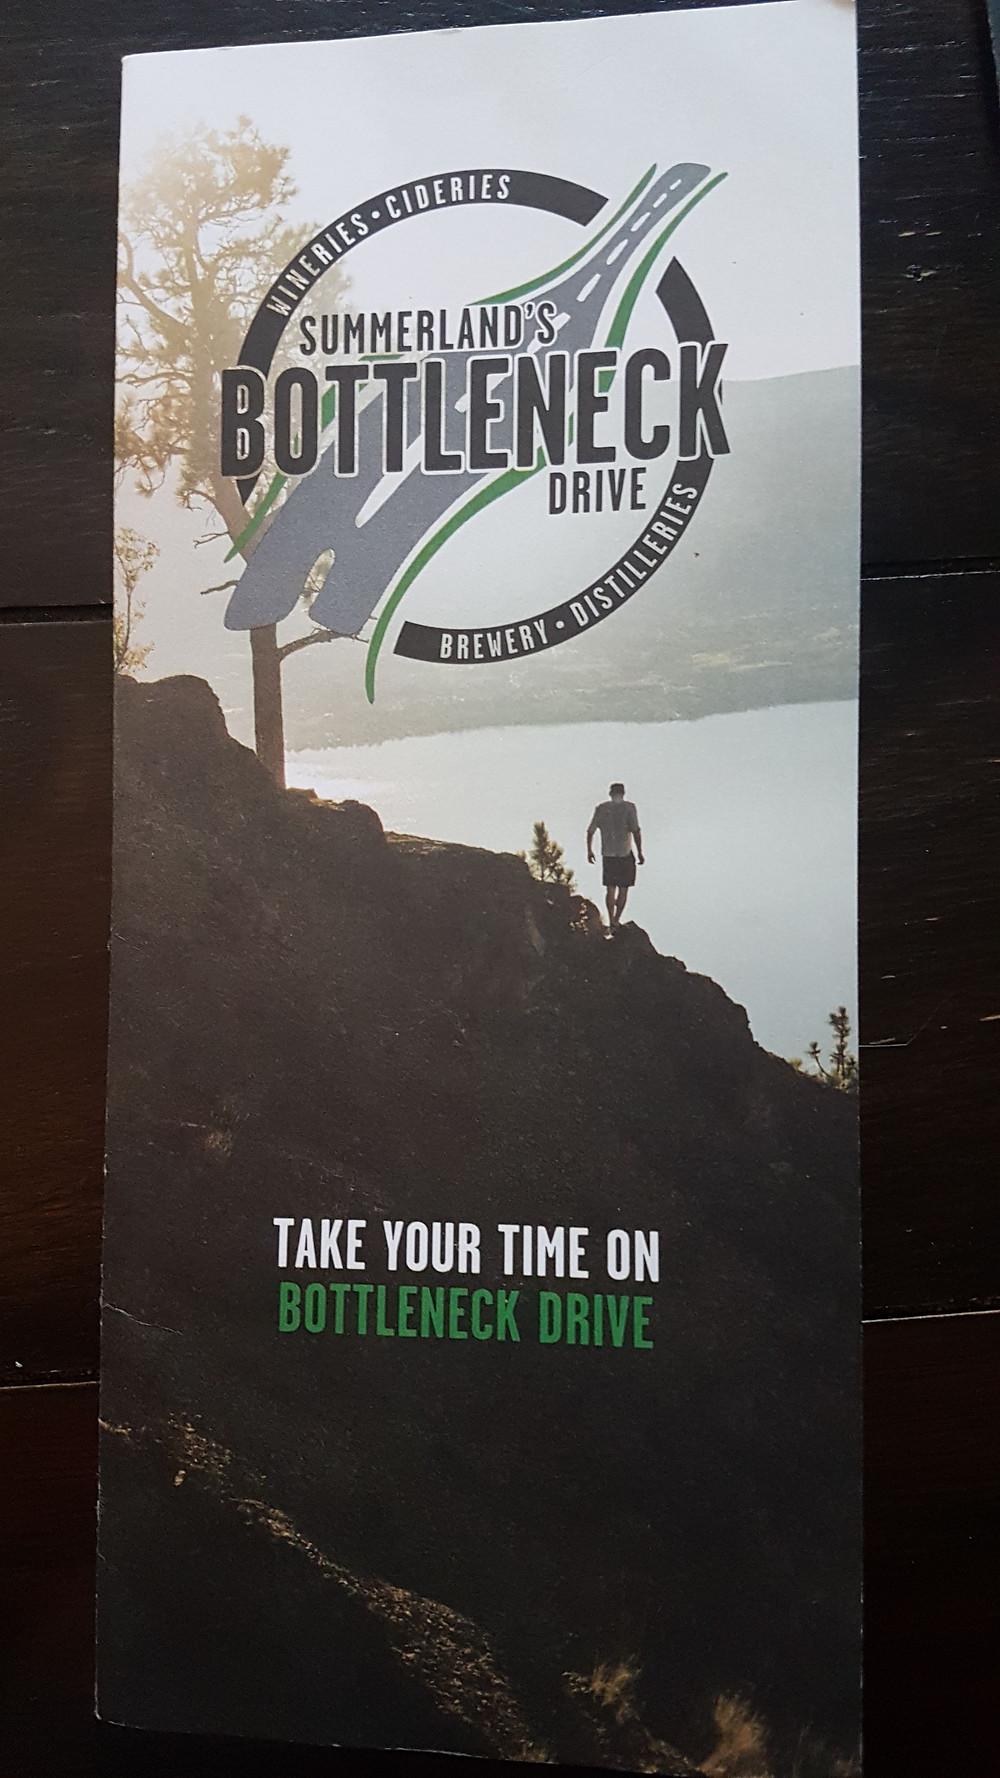 Bottleneck Drive, Summerland BC, Canada